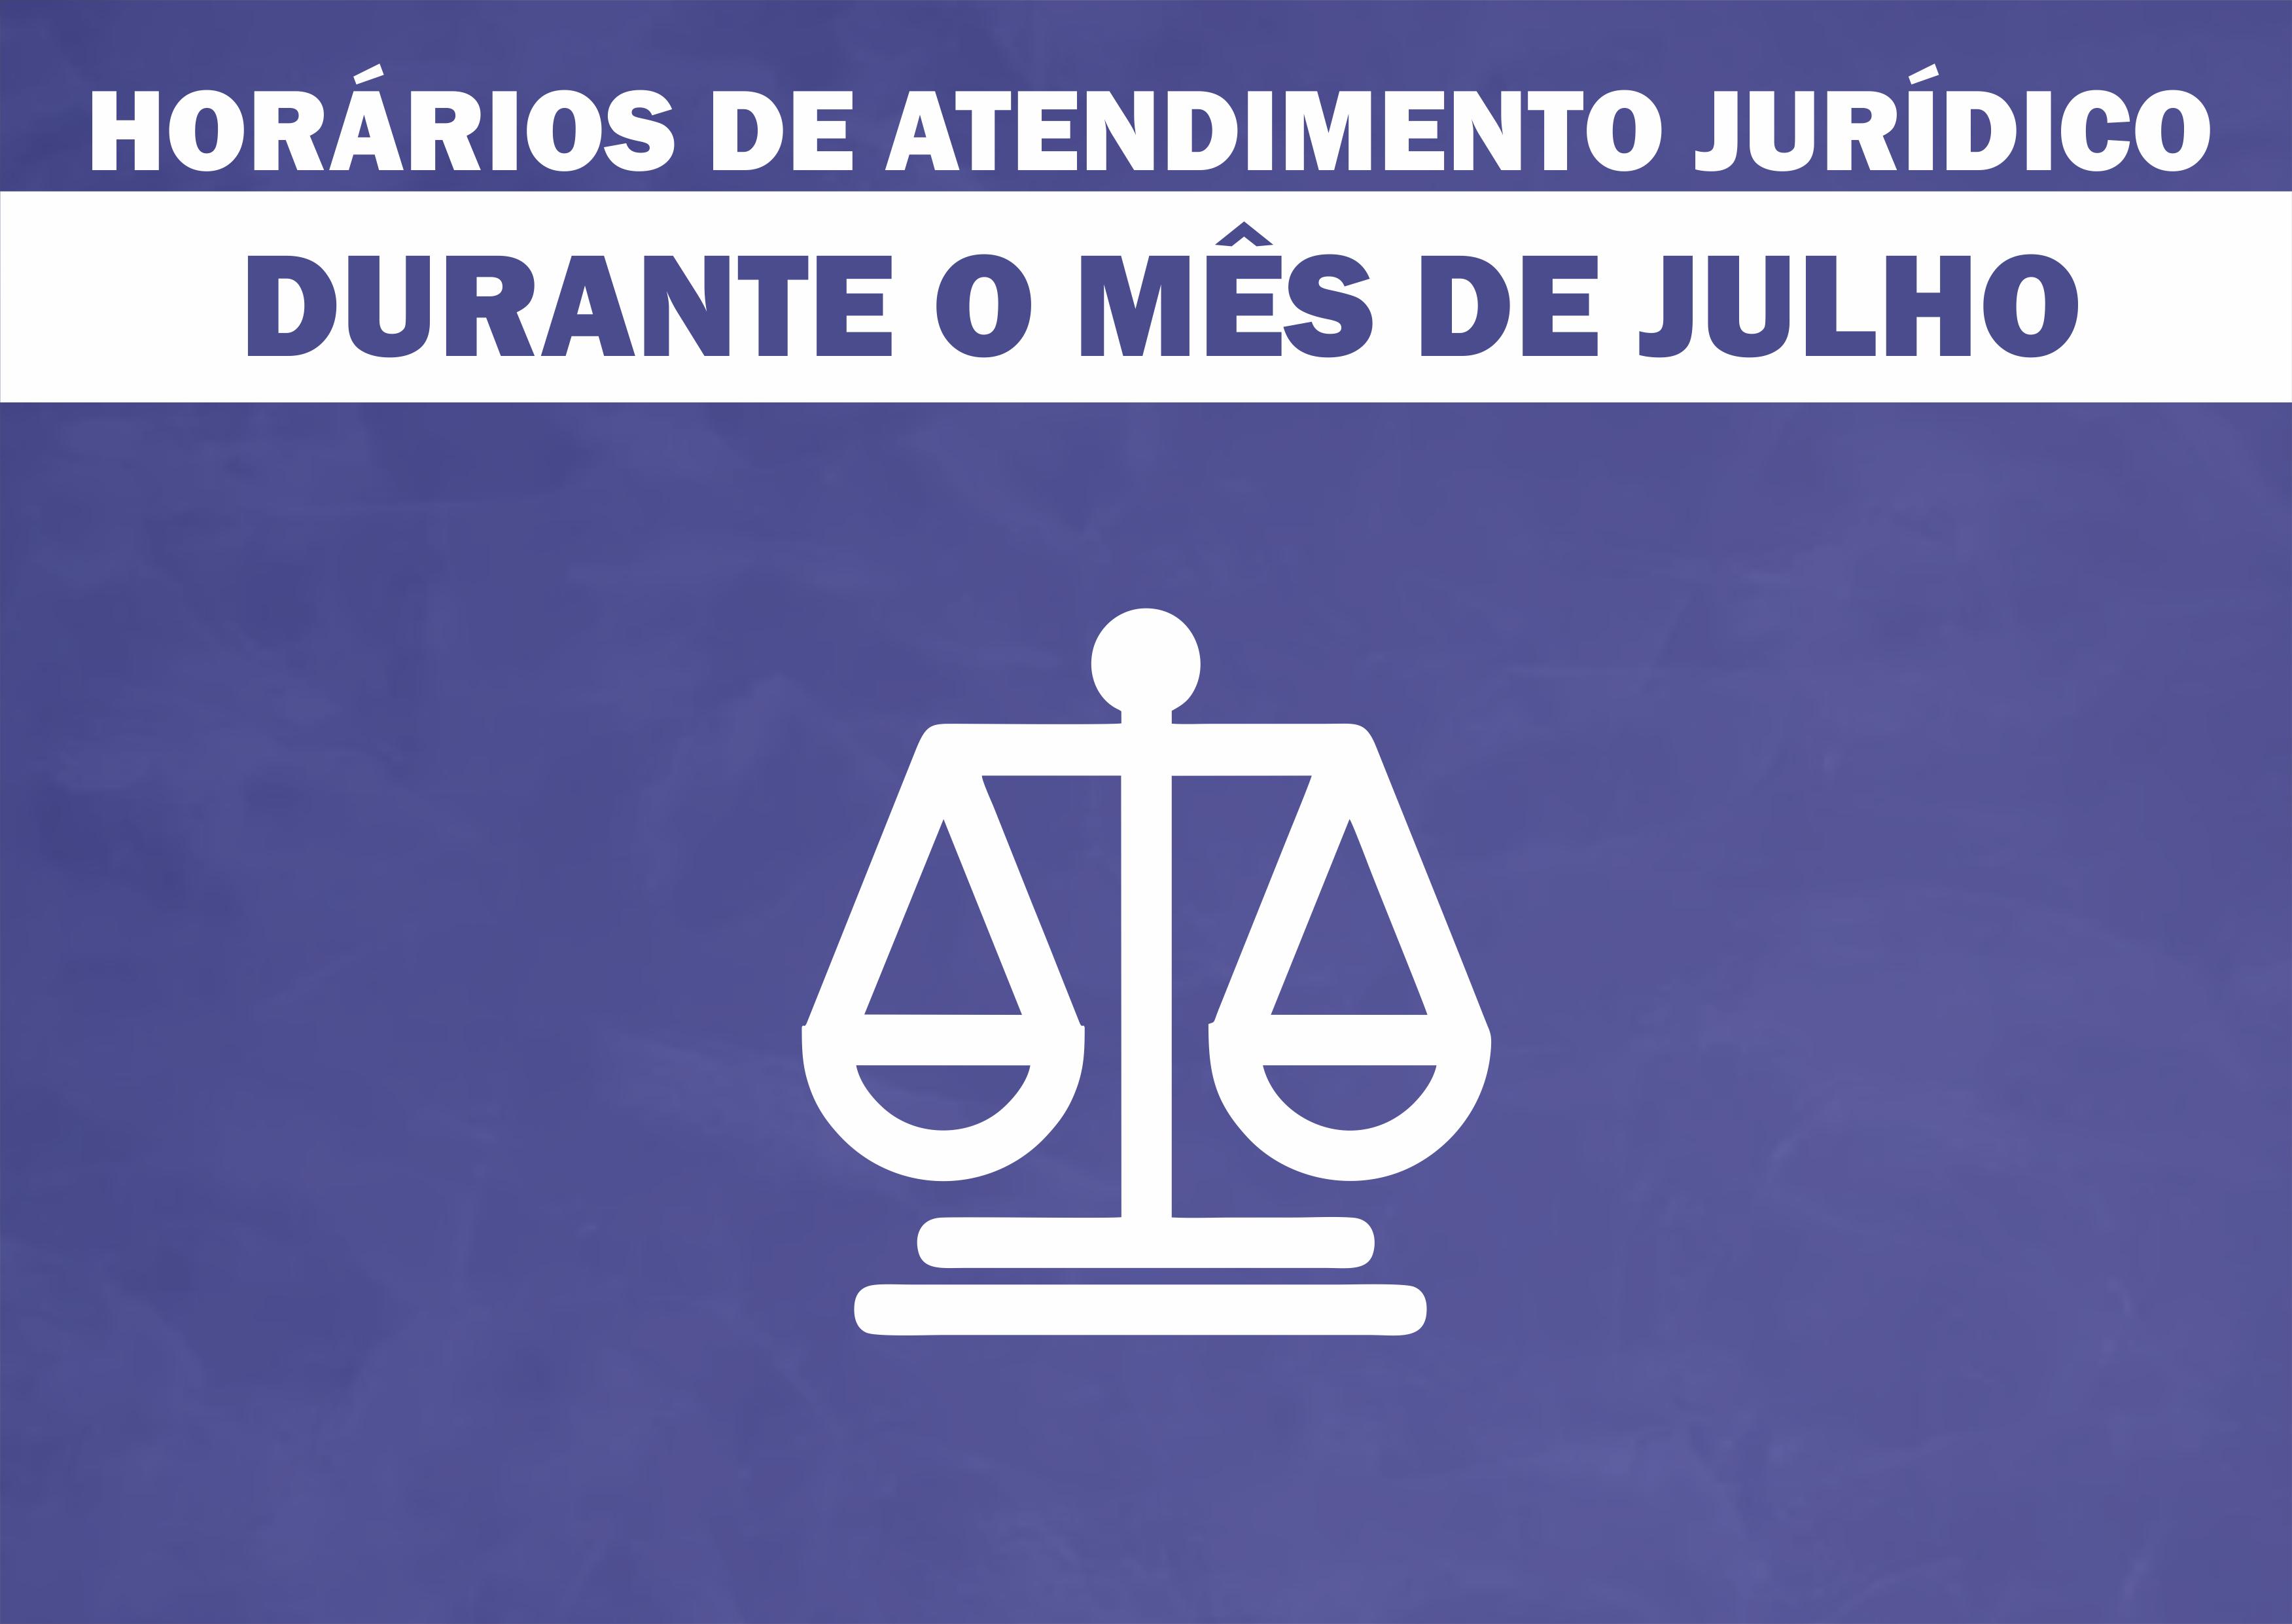 Informe do departamento jurídico sobre os dias de atendimento